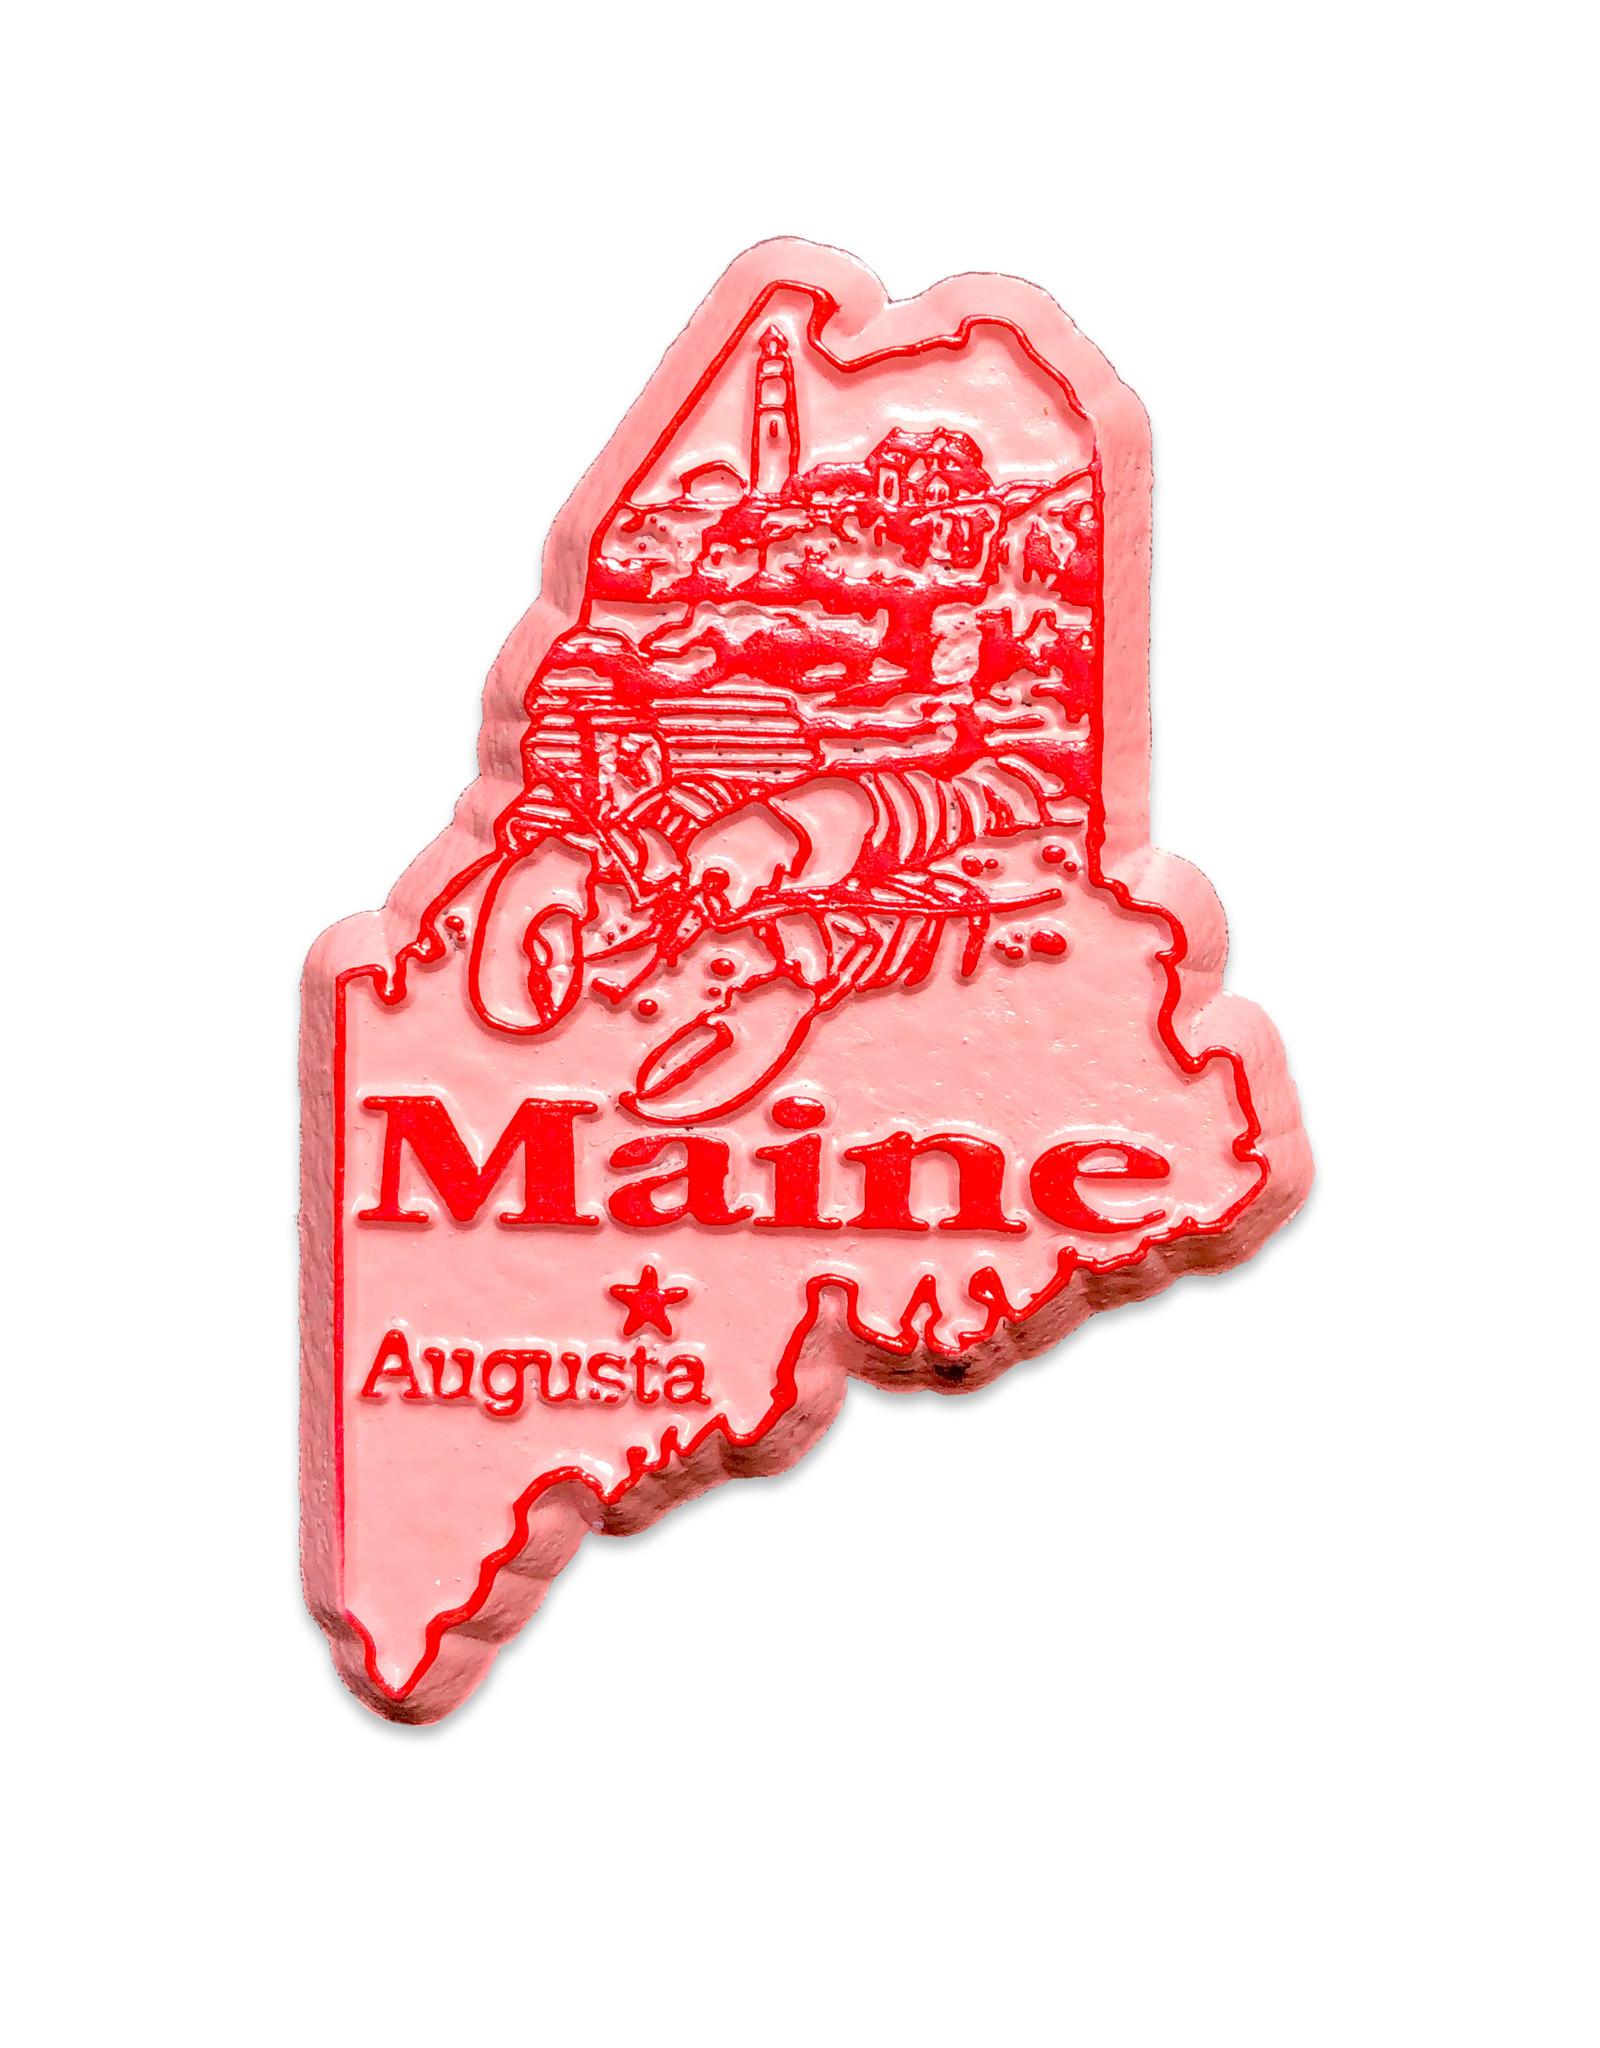 Maine Capital Magnet